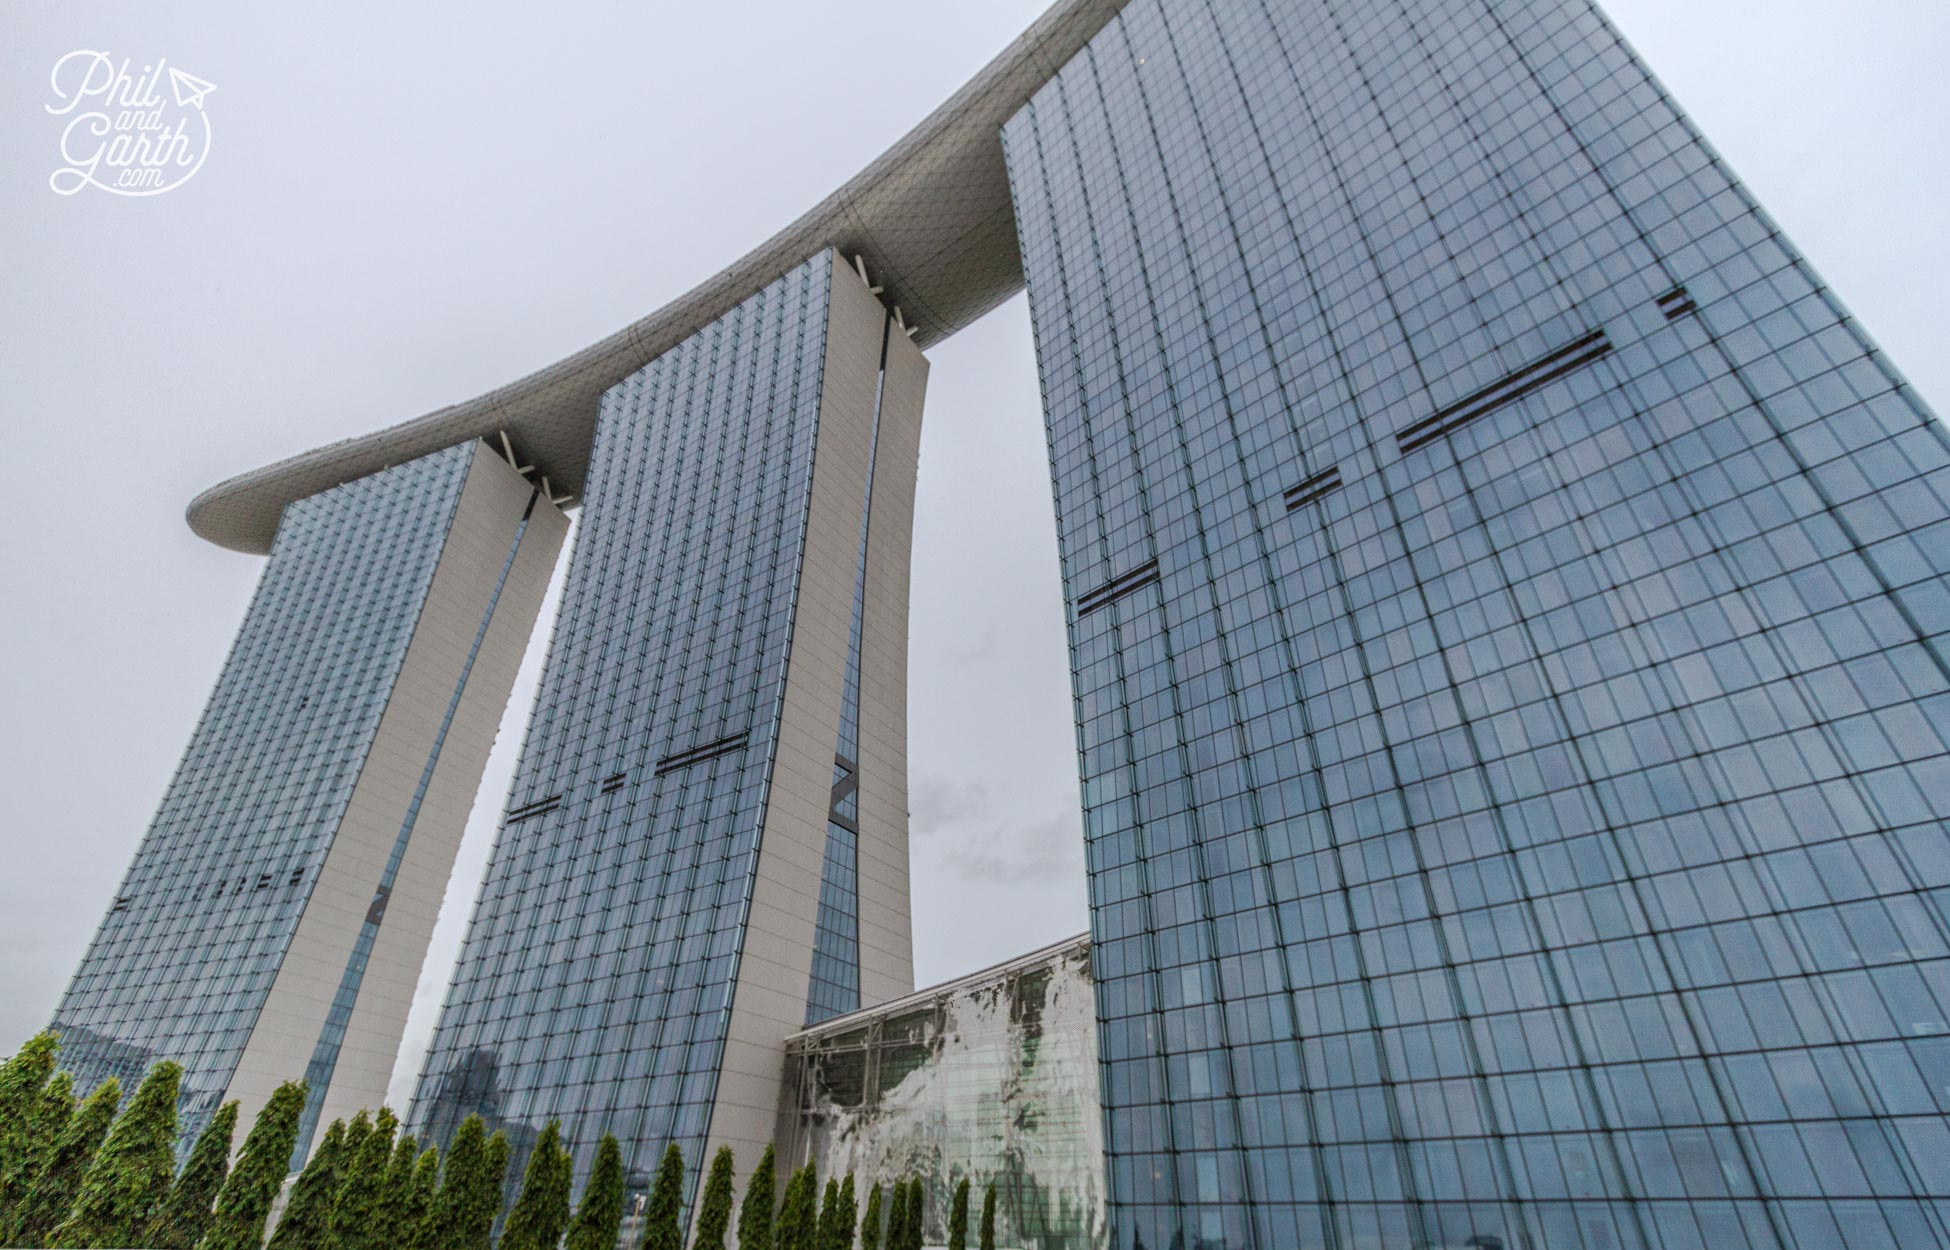 The landmark Marina Bay Sands hotel in Singapore